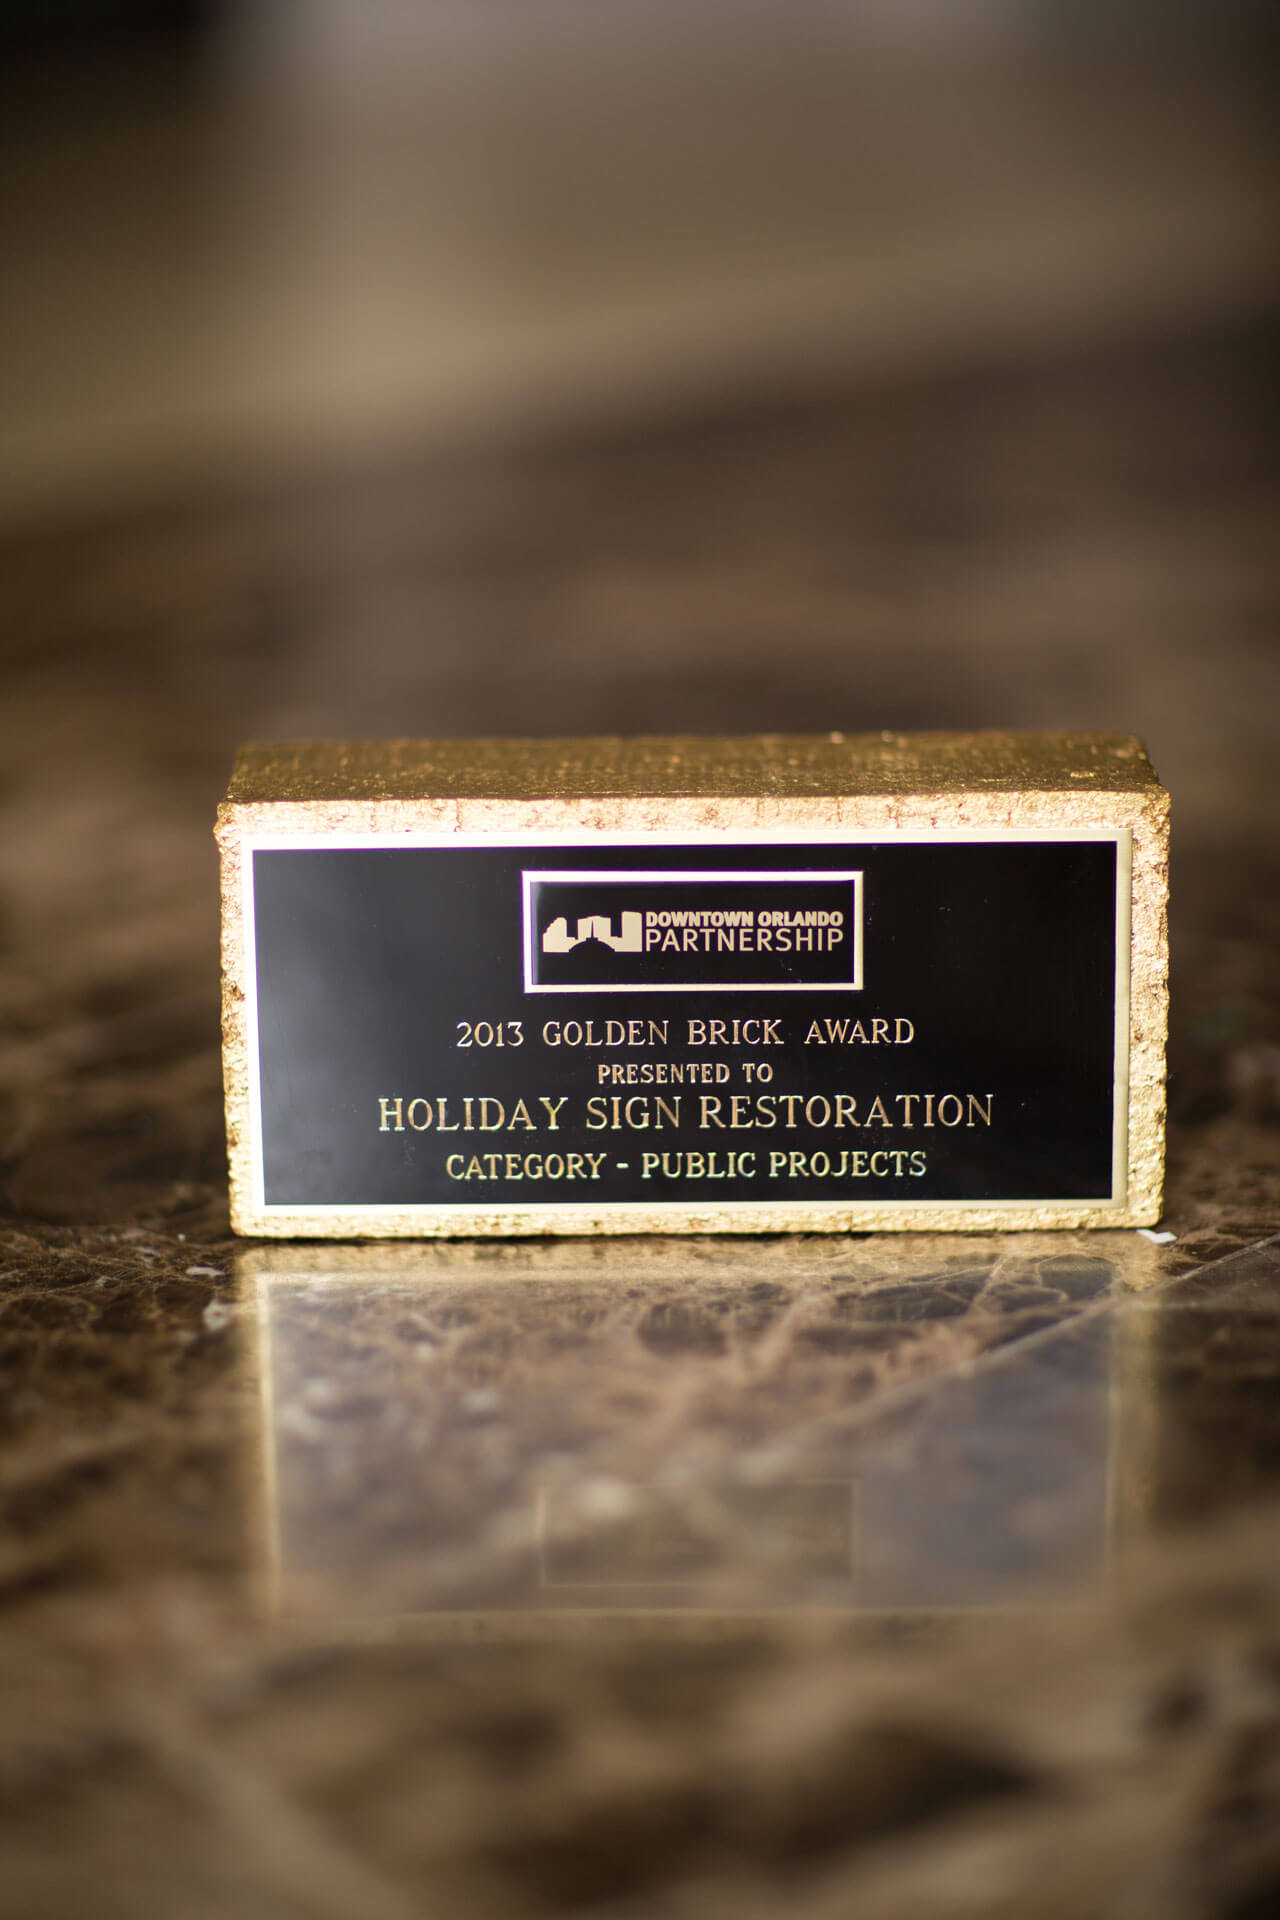 Golden Brick Award - Holiday Sign Restoration - Ivanhoe Village - Orlando FL